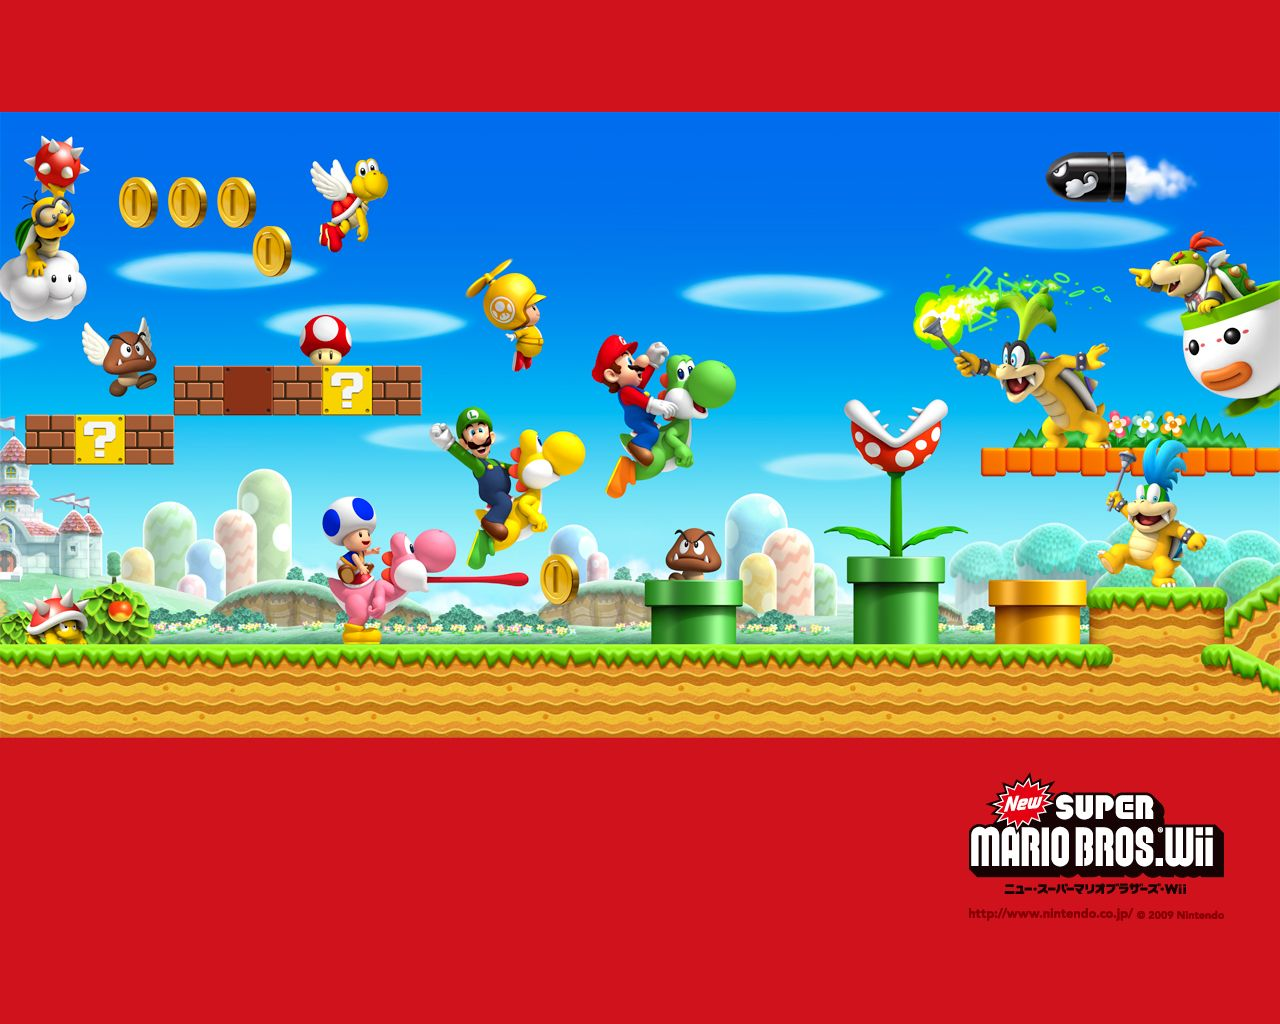 Renter S Wallpaper New Super Mario Bros Wii Frenterojo Videojuegos